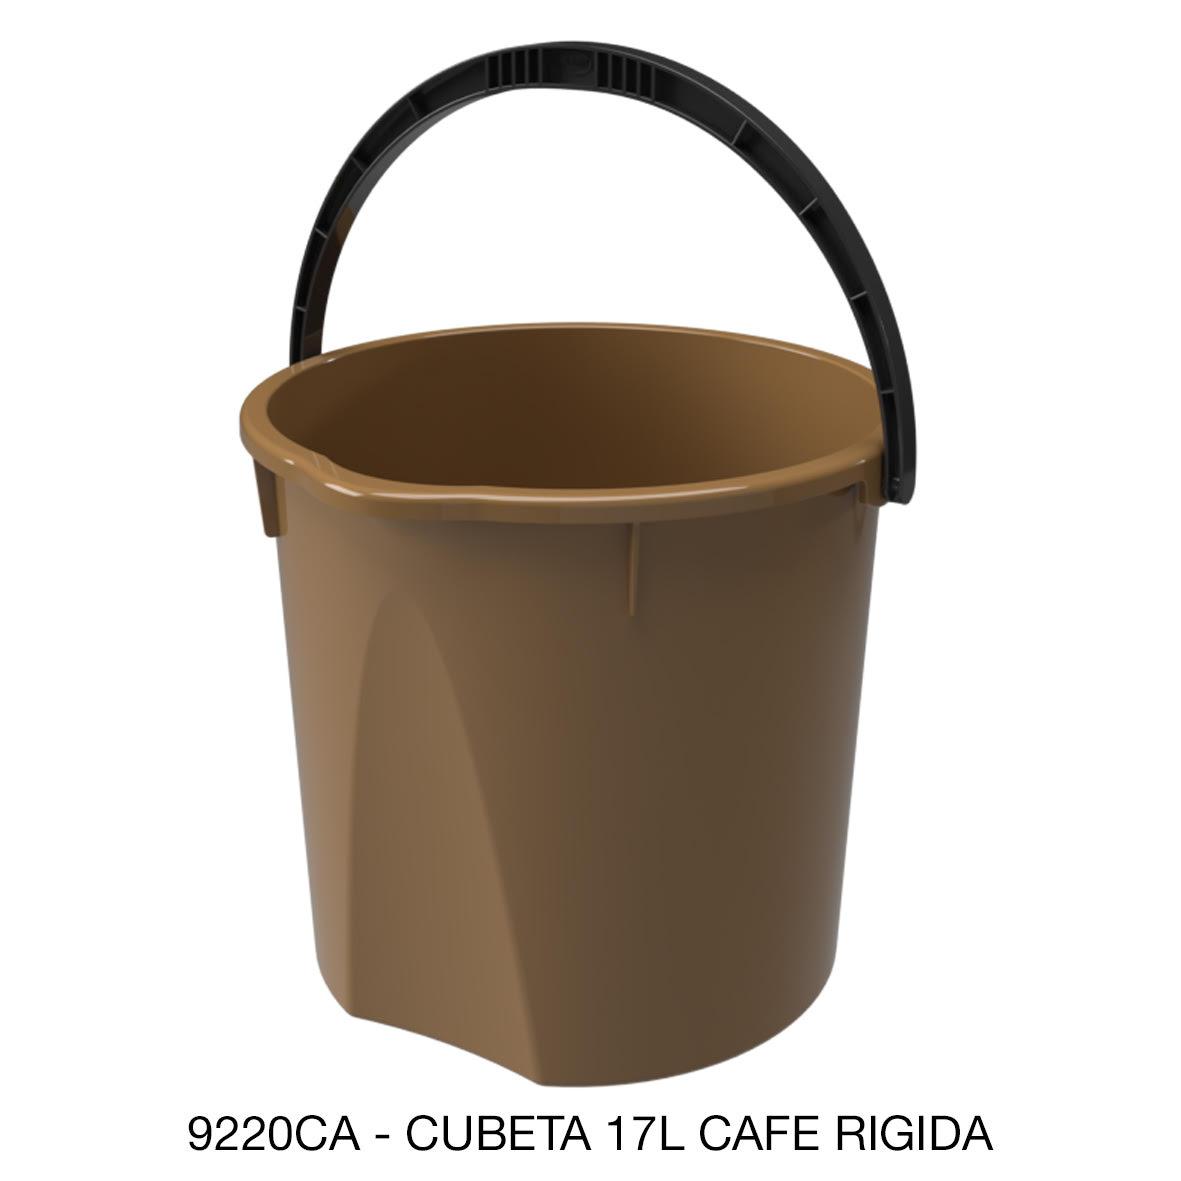 Cubeta resistente de 17 litros rígida color café modelo 9220CA de Sablón